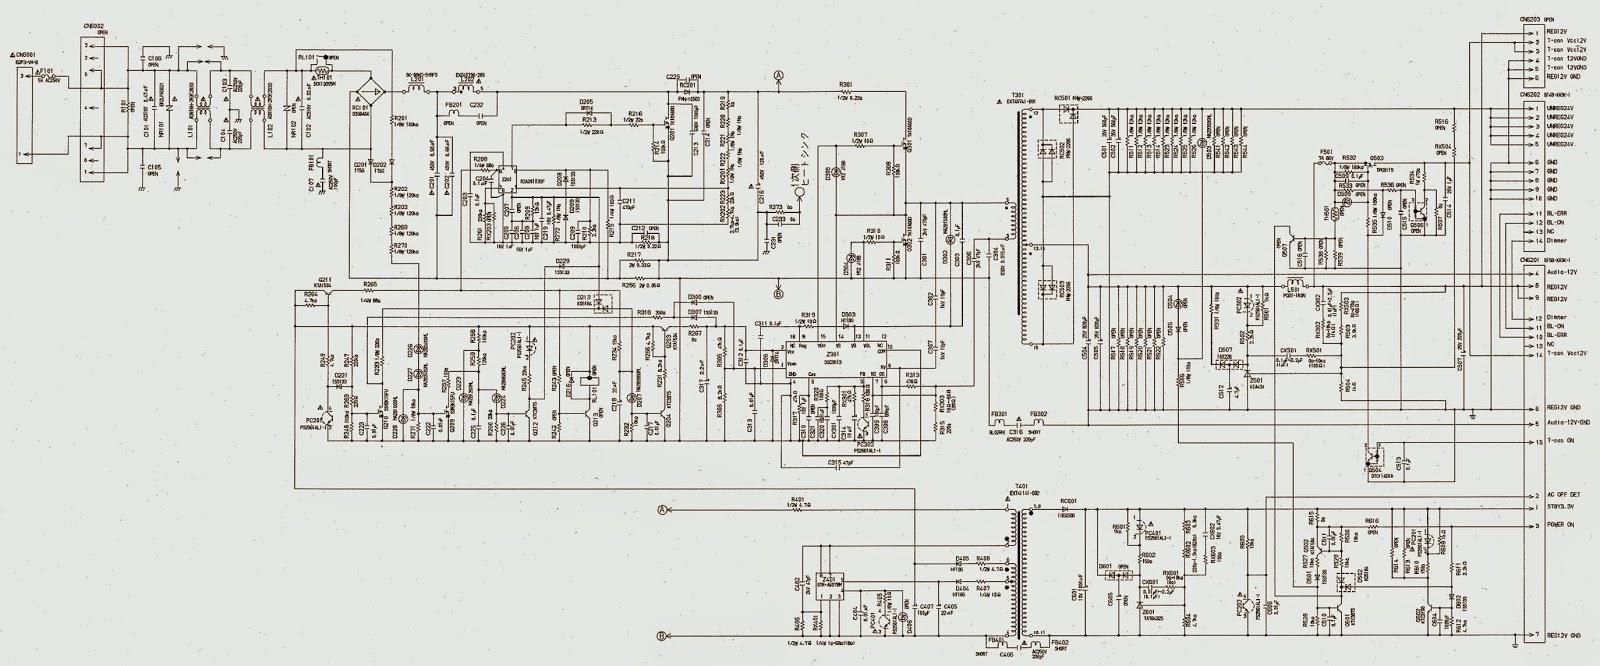 Electronic Equipment Repair Centre   Sony Kdl